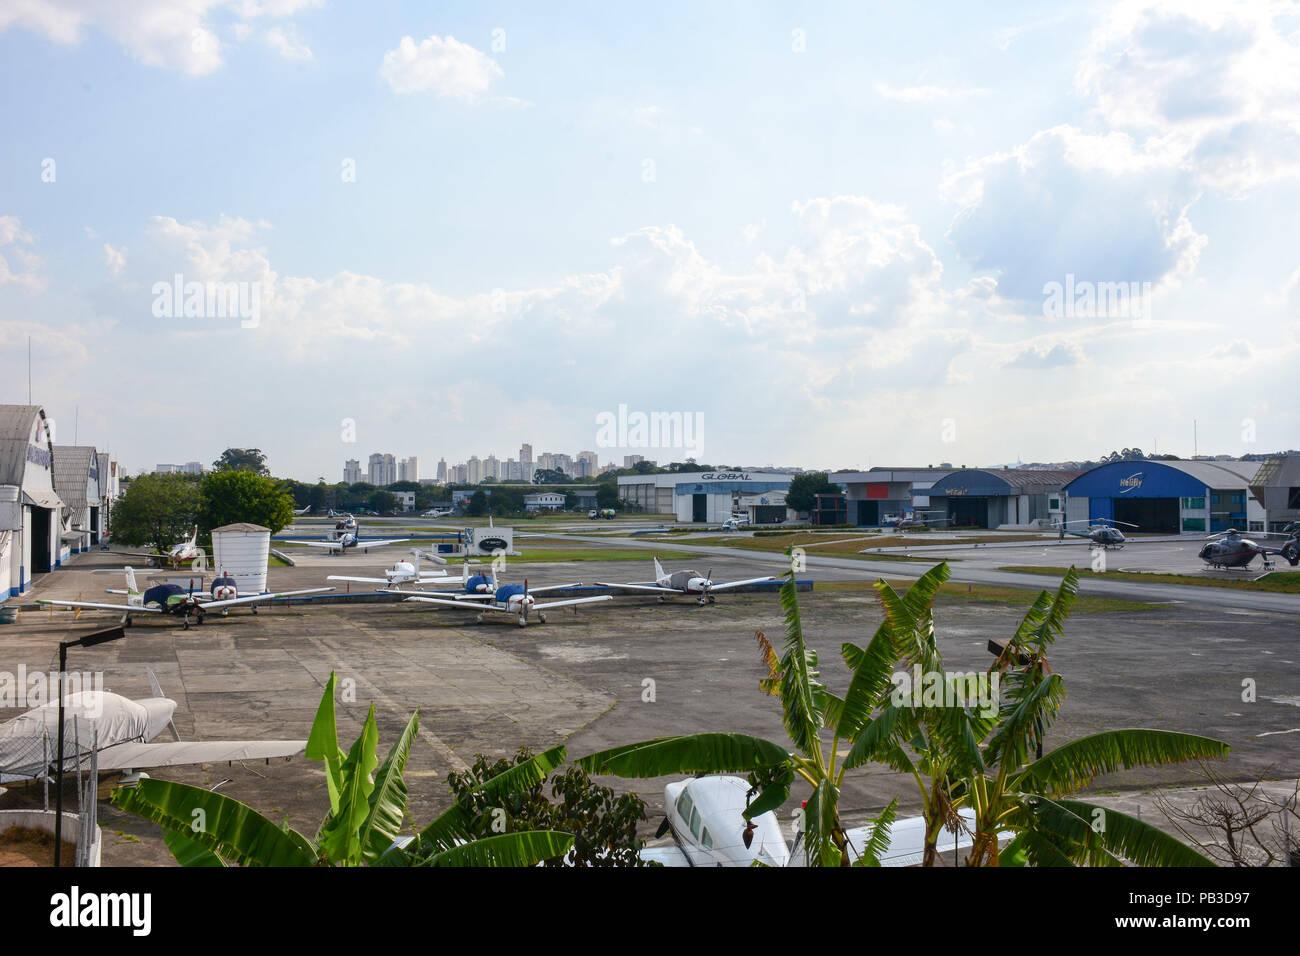 Aeroporto Sp : SÃo paulo sp 26.07.2018: aeroporto campo de marte sp campo de